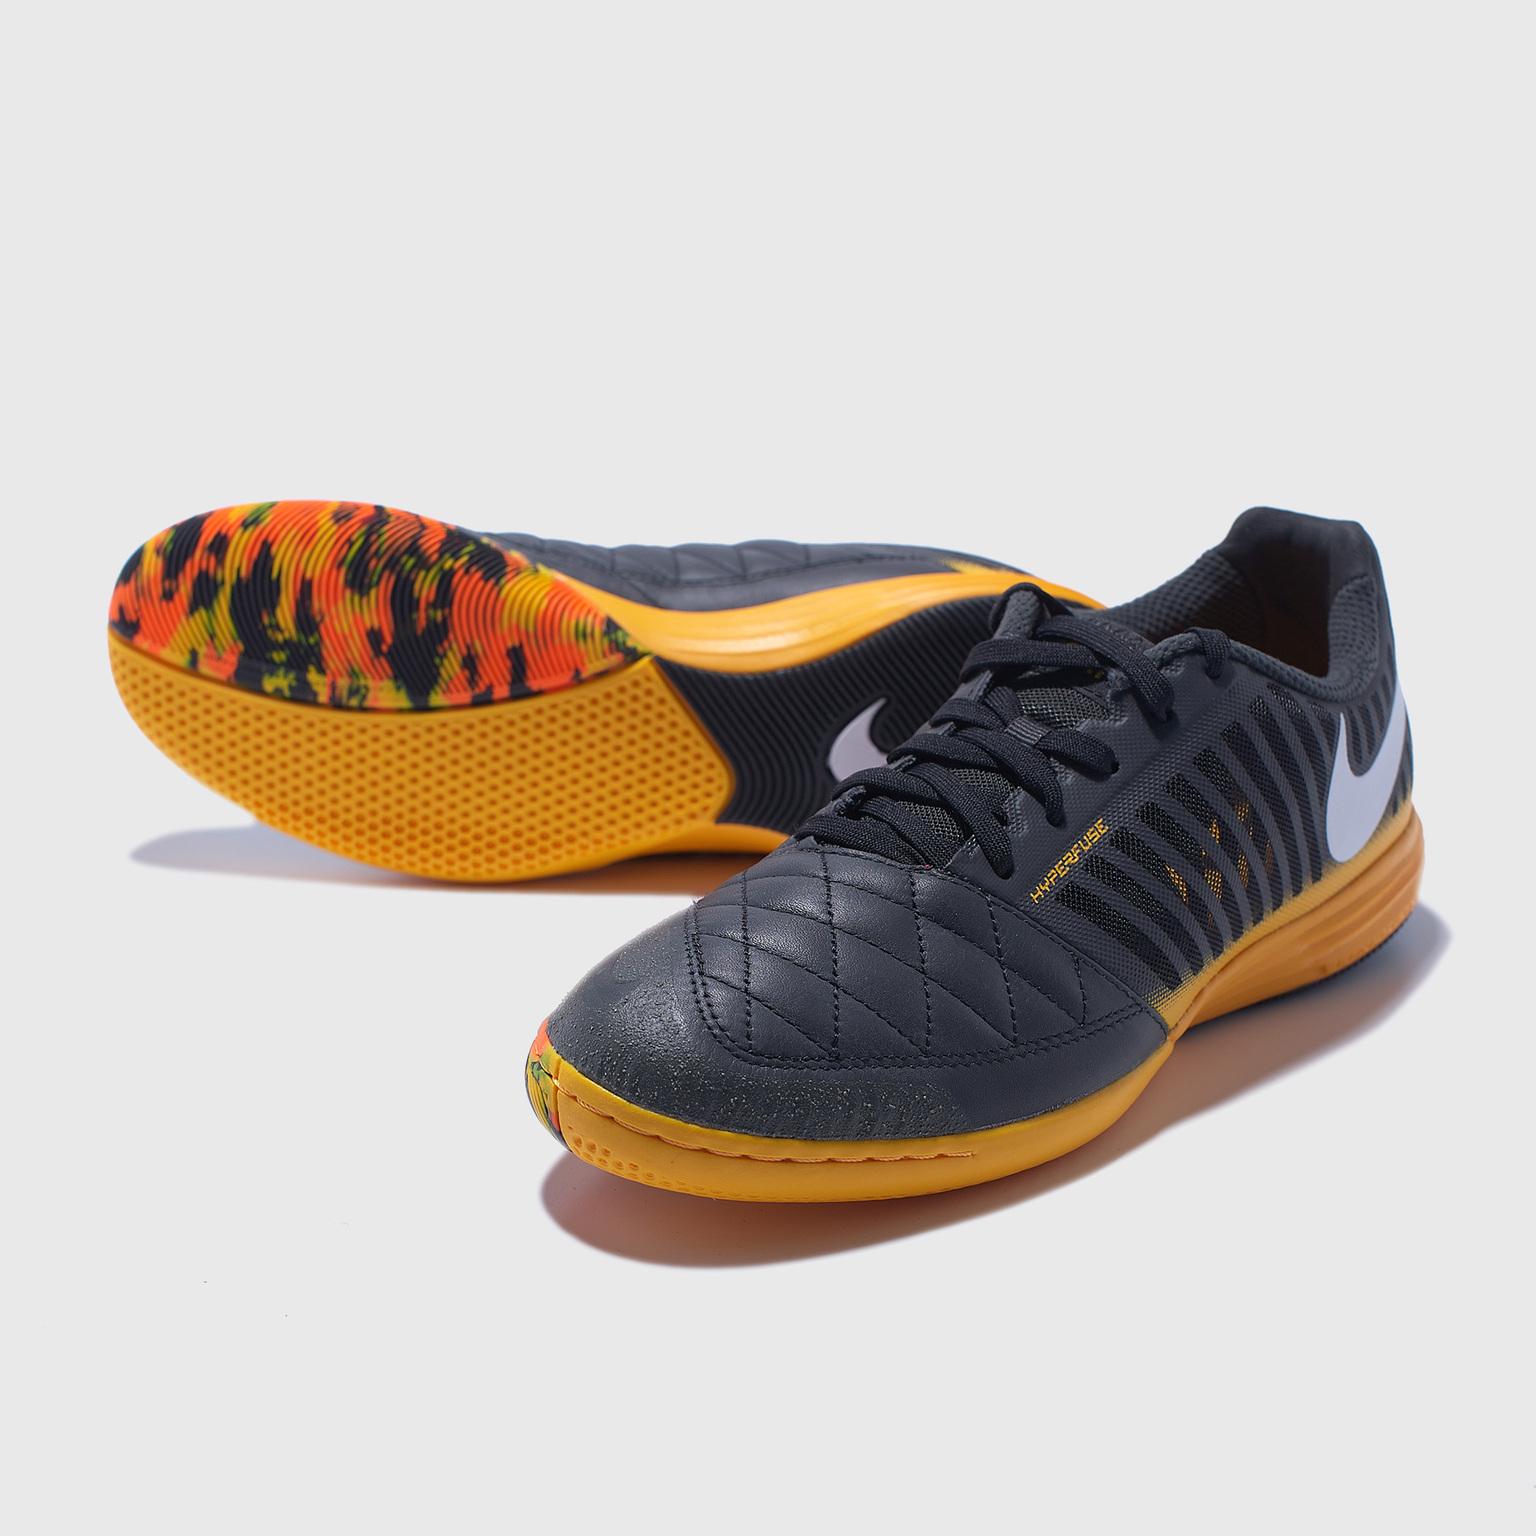 Футзалки Nike LunarGato II 580456-018 цена 2017